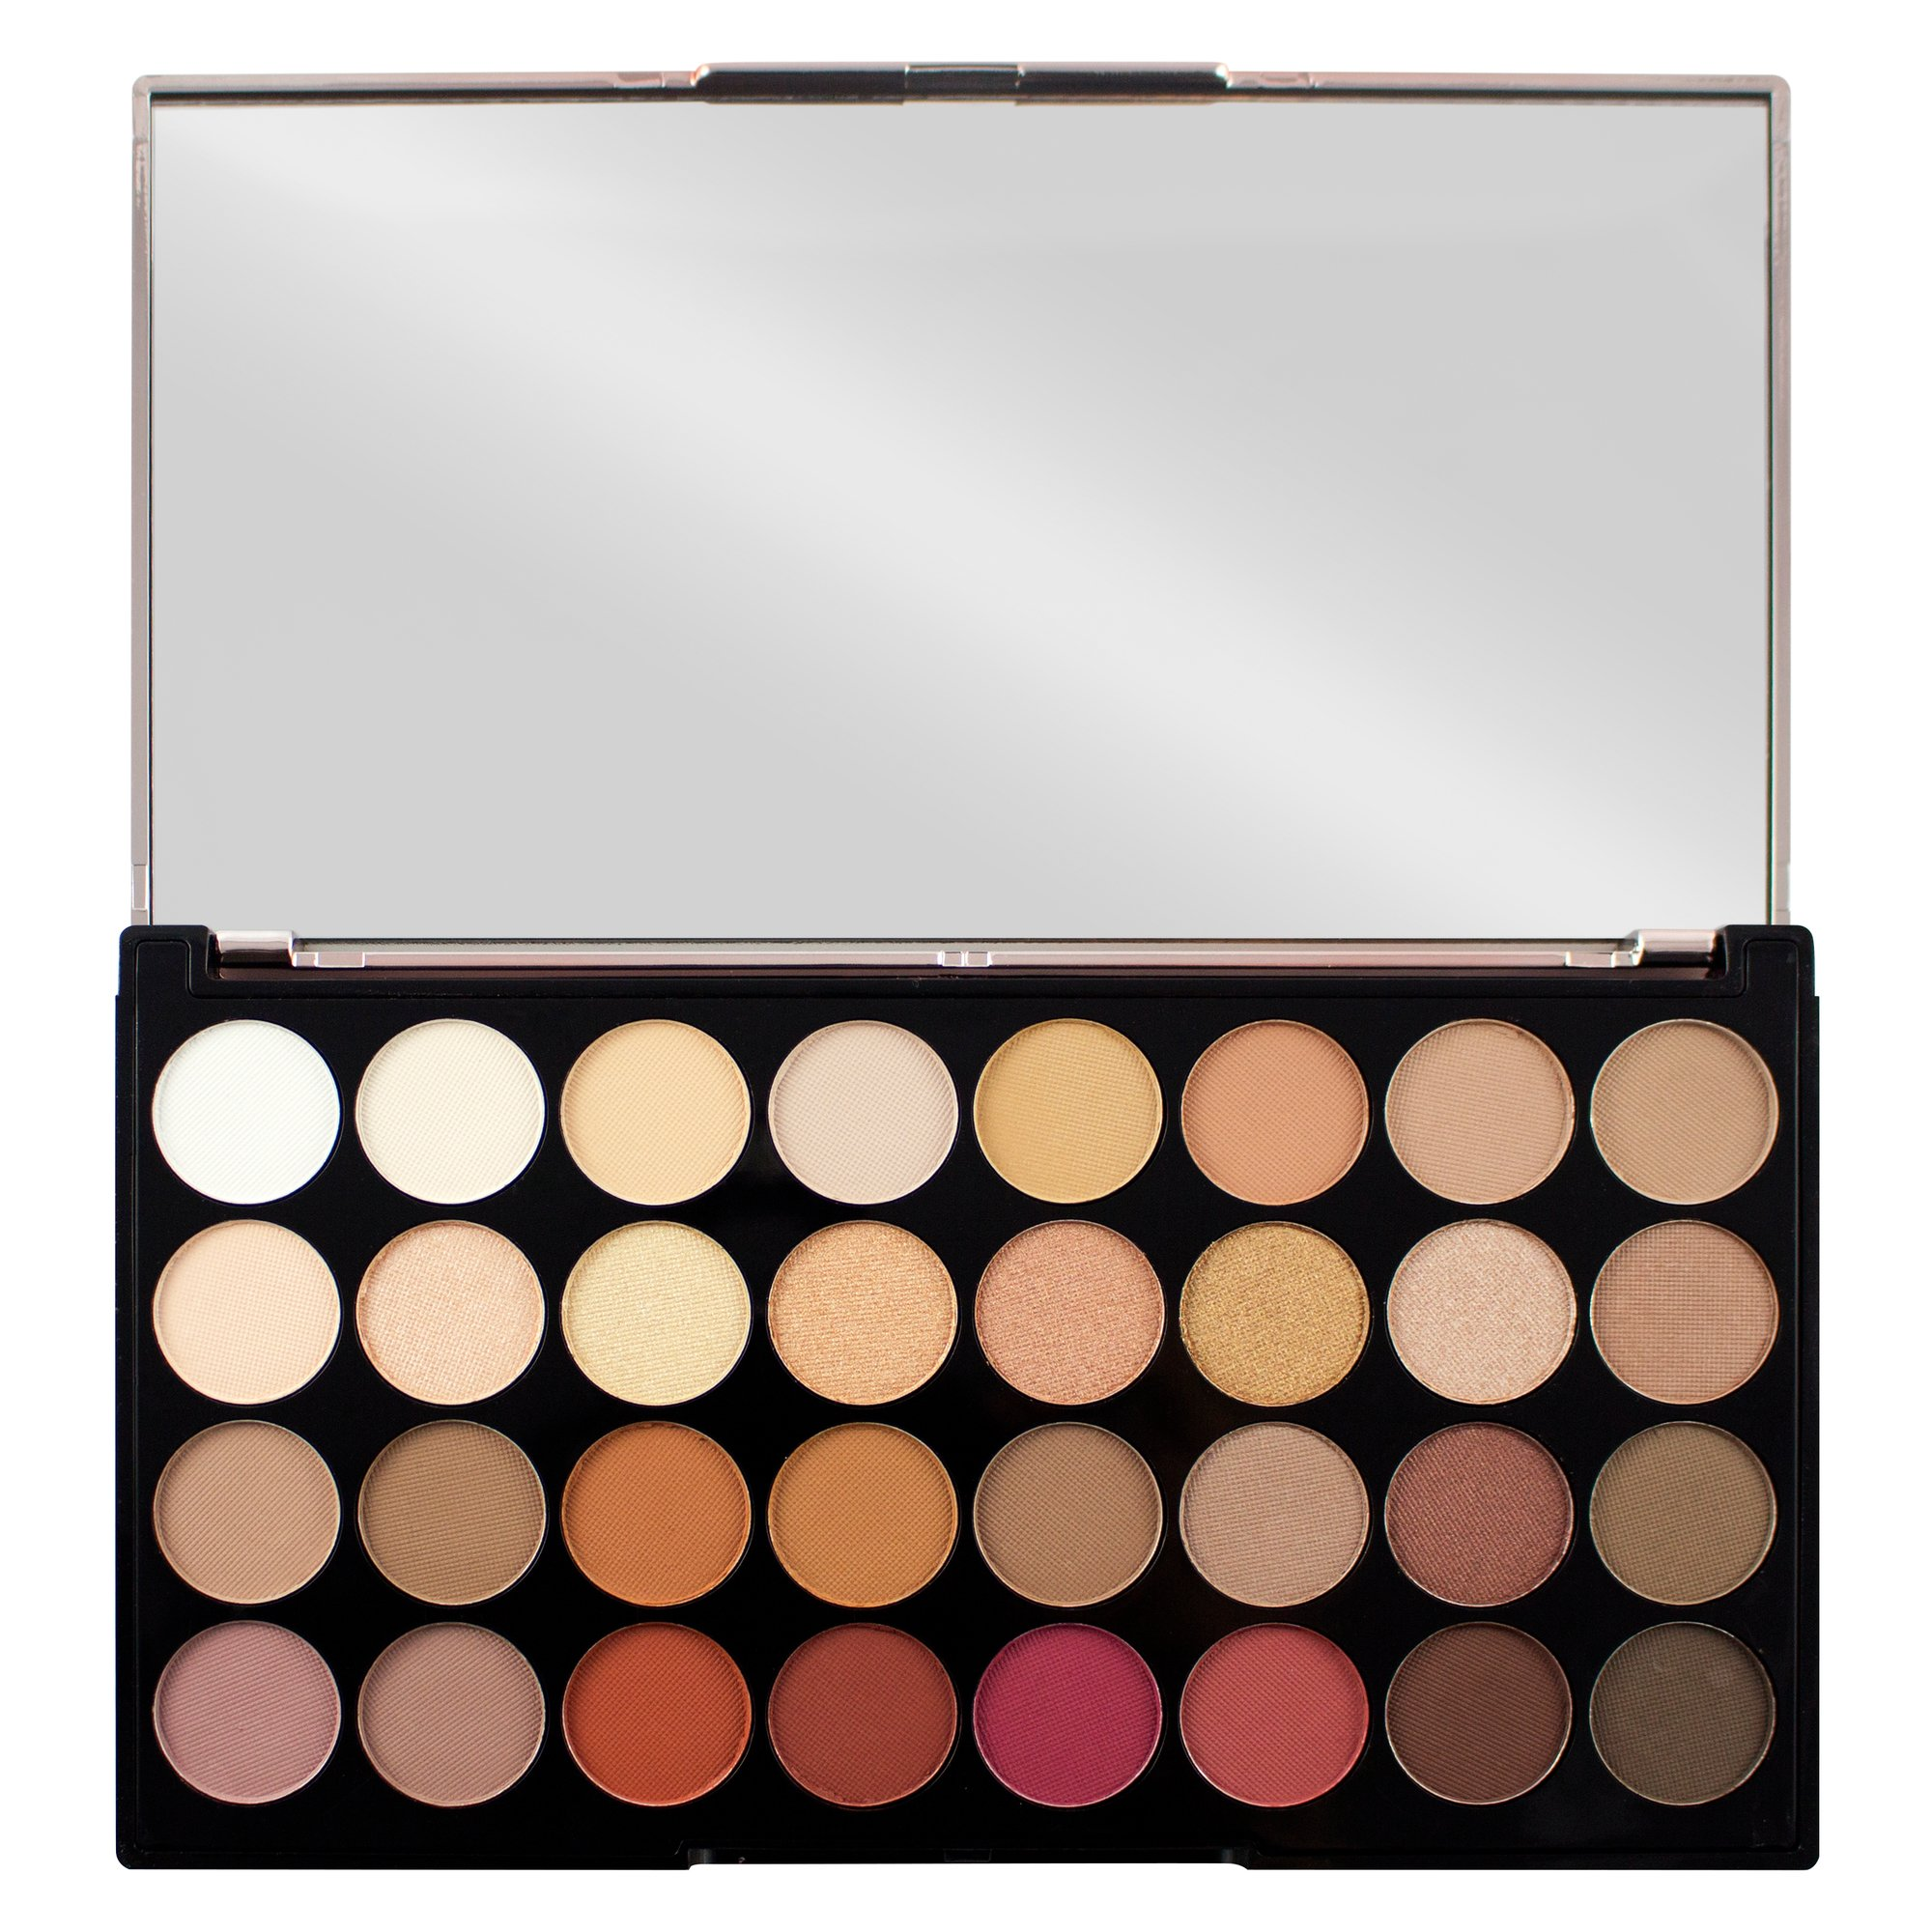 Makeup Revolution Ultra 32 Flawless 3 Resurrection Shadow Palette